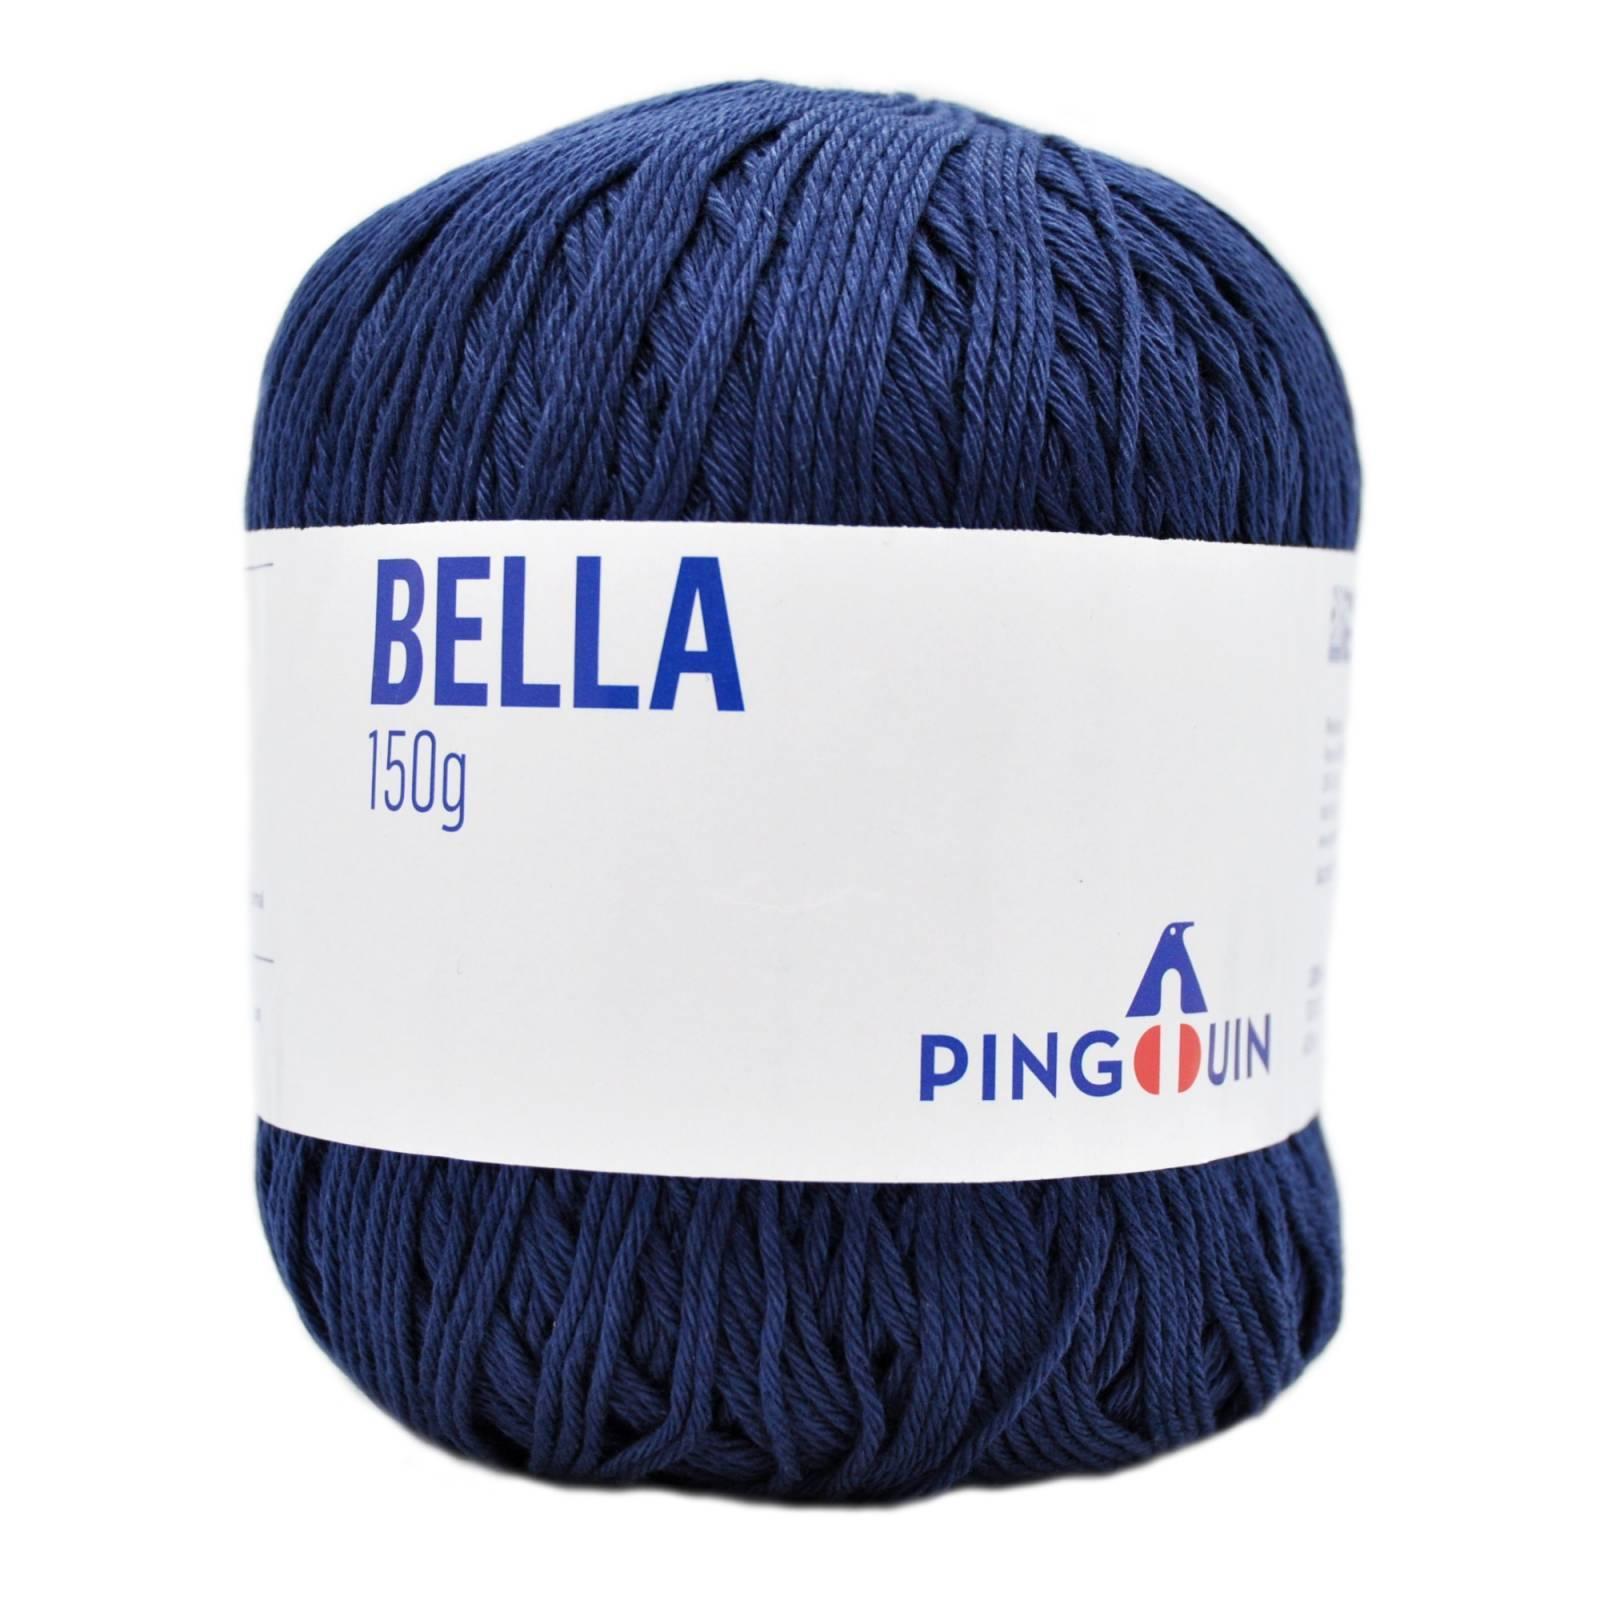 Fio Bella 5513 ravenna - BAÚ DA VOVÓ